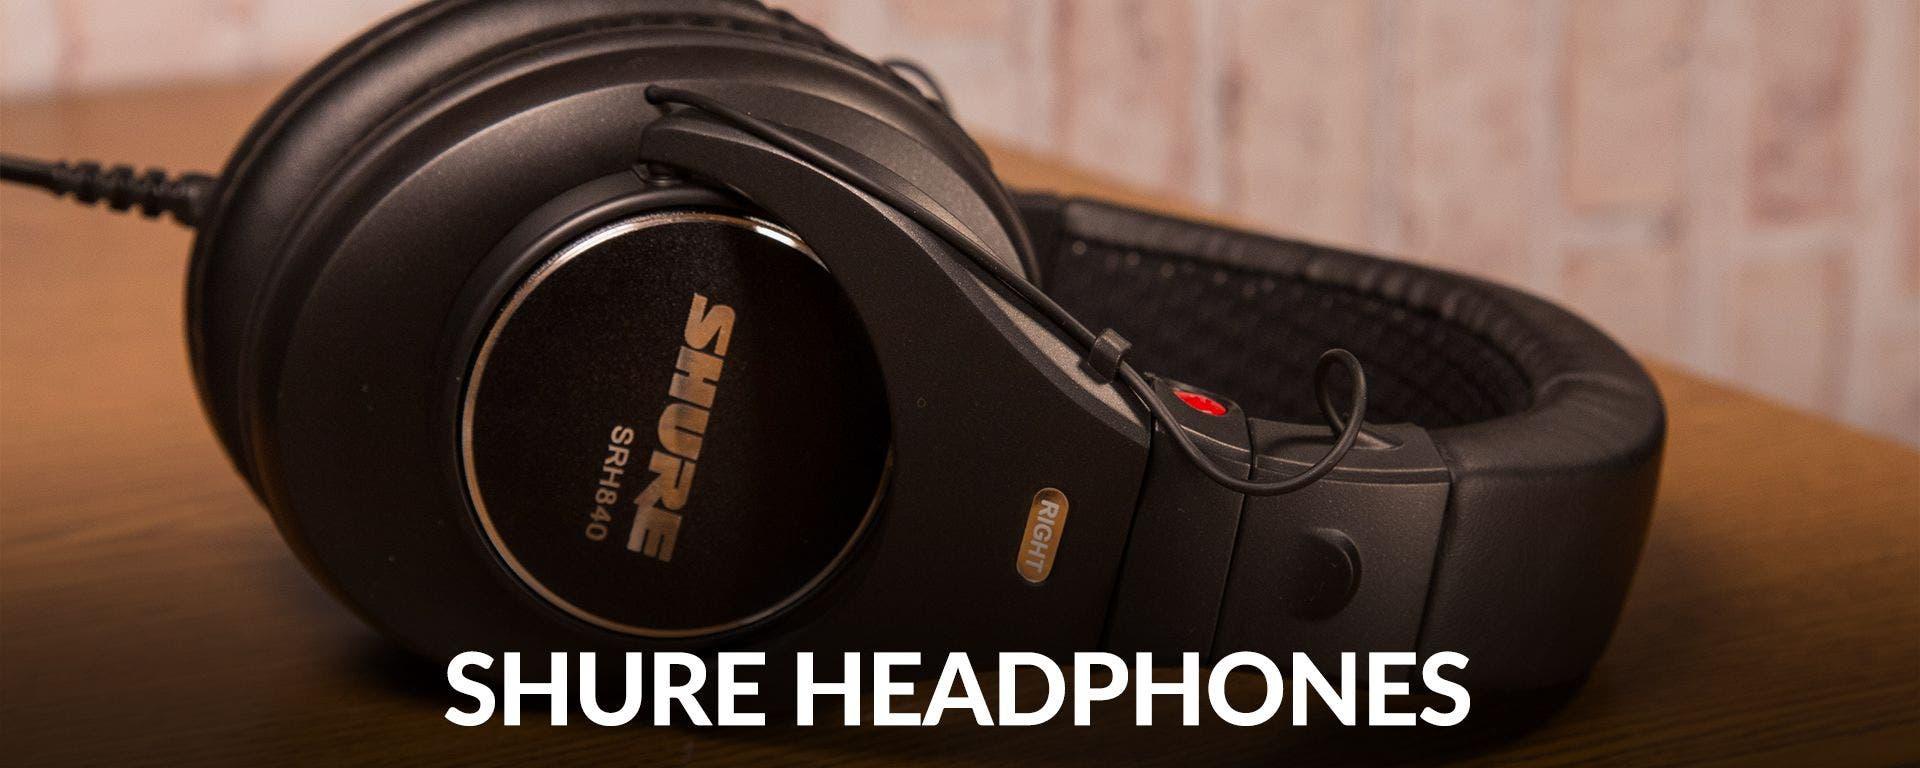 Shure Headphones at Sam Ash